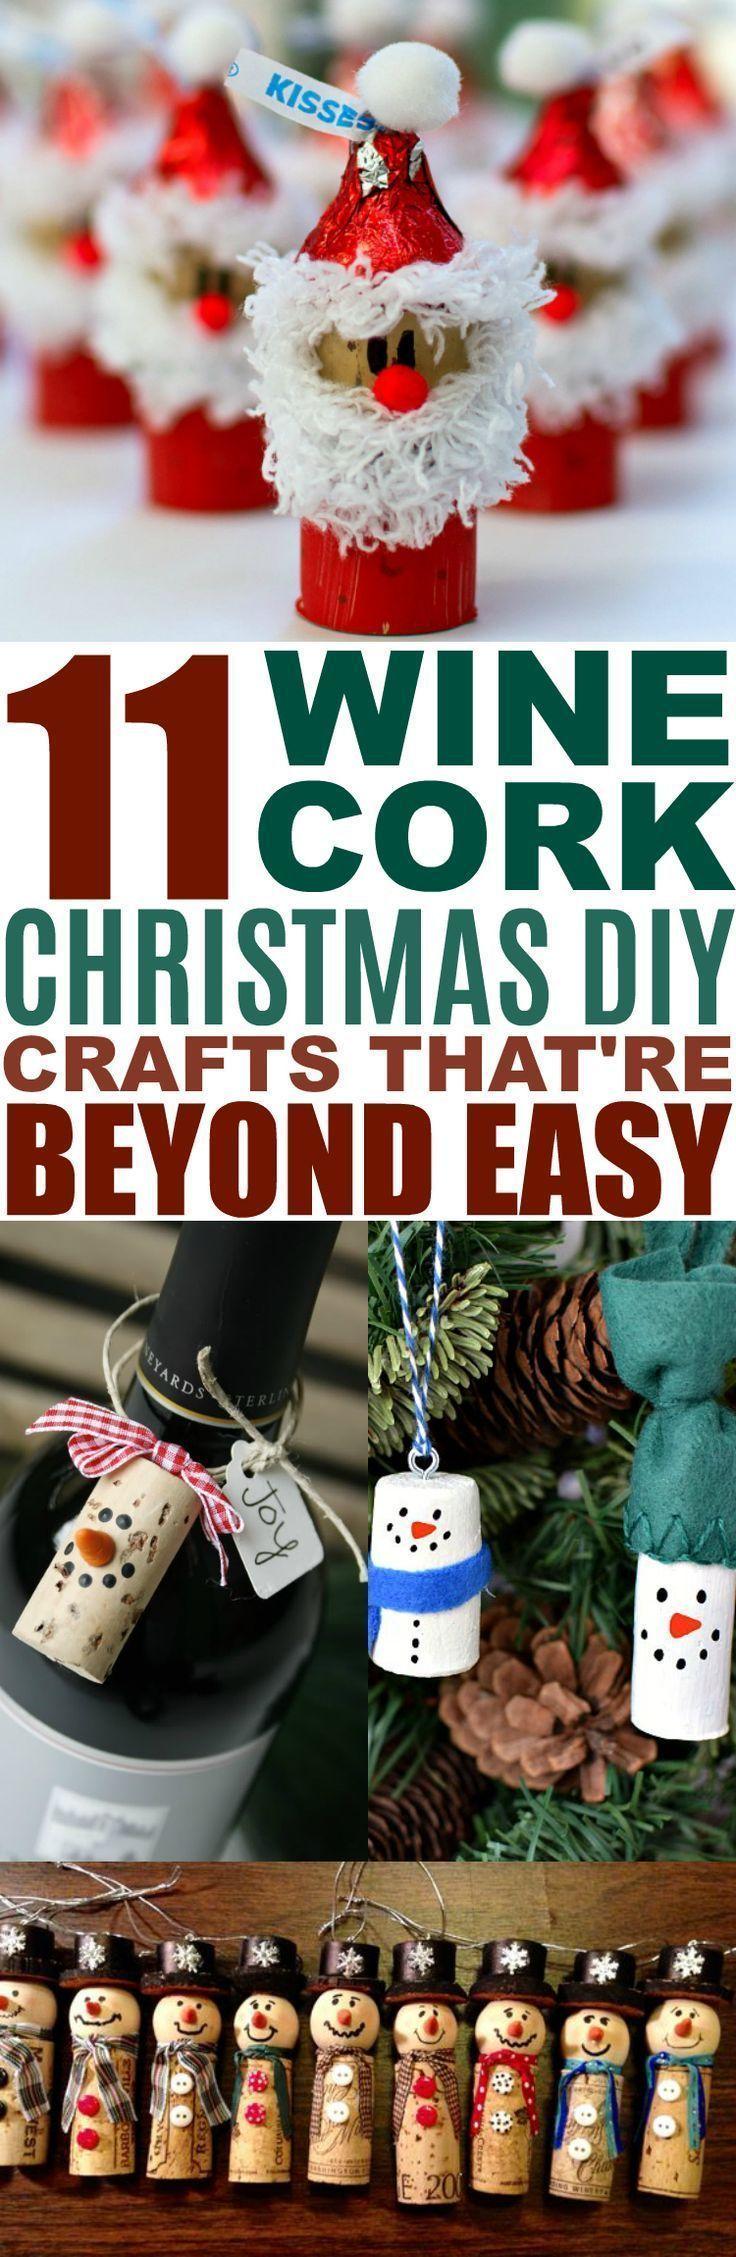 11 Christmas Wine Cork Crafts You Need to DIY ASAP